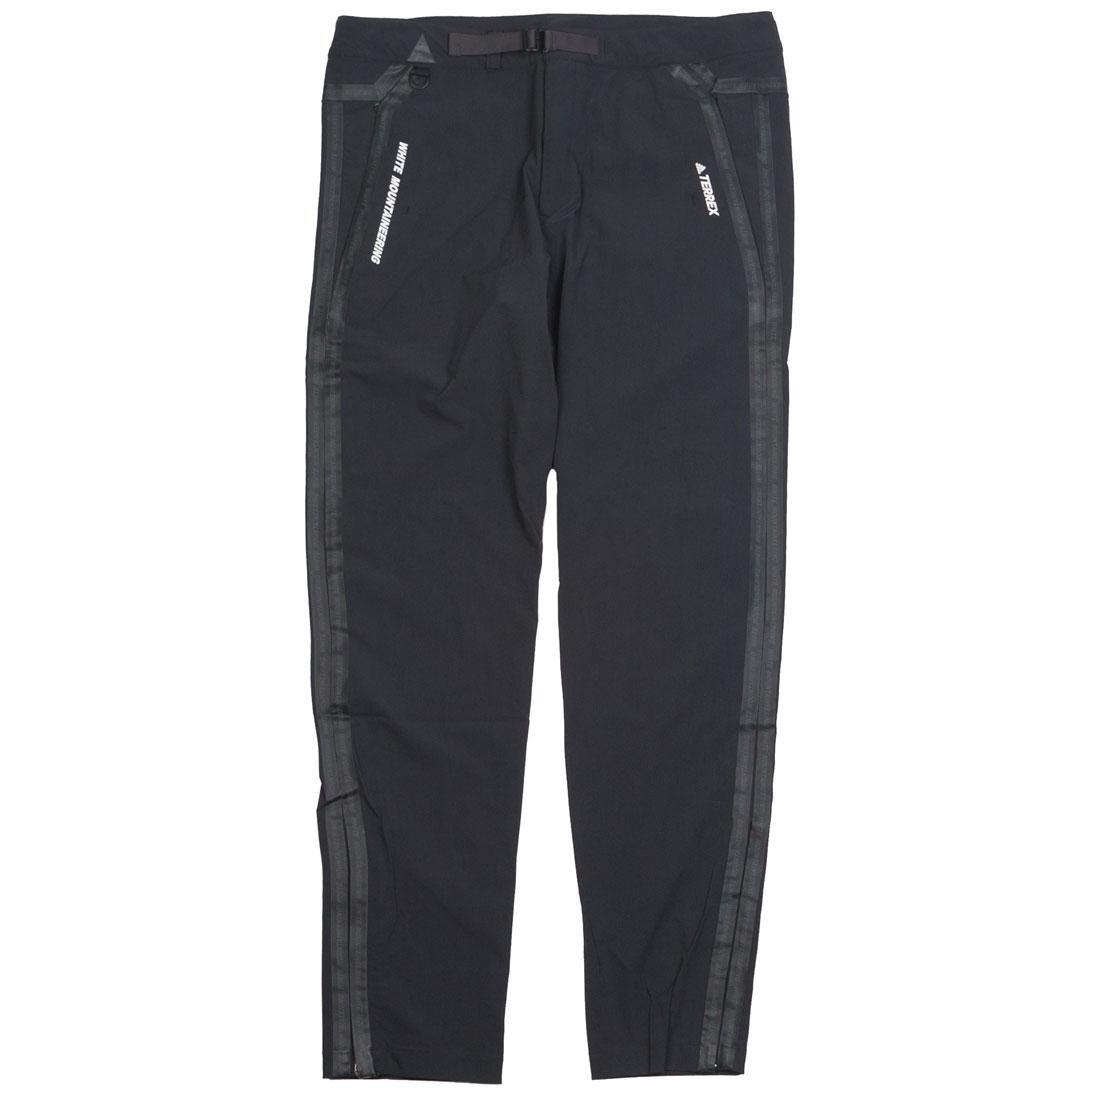 Adidas x White Mountaineering Men WM Slim Pants (black)